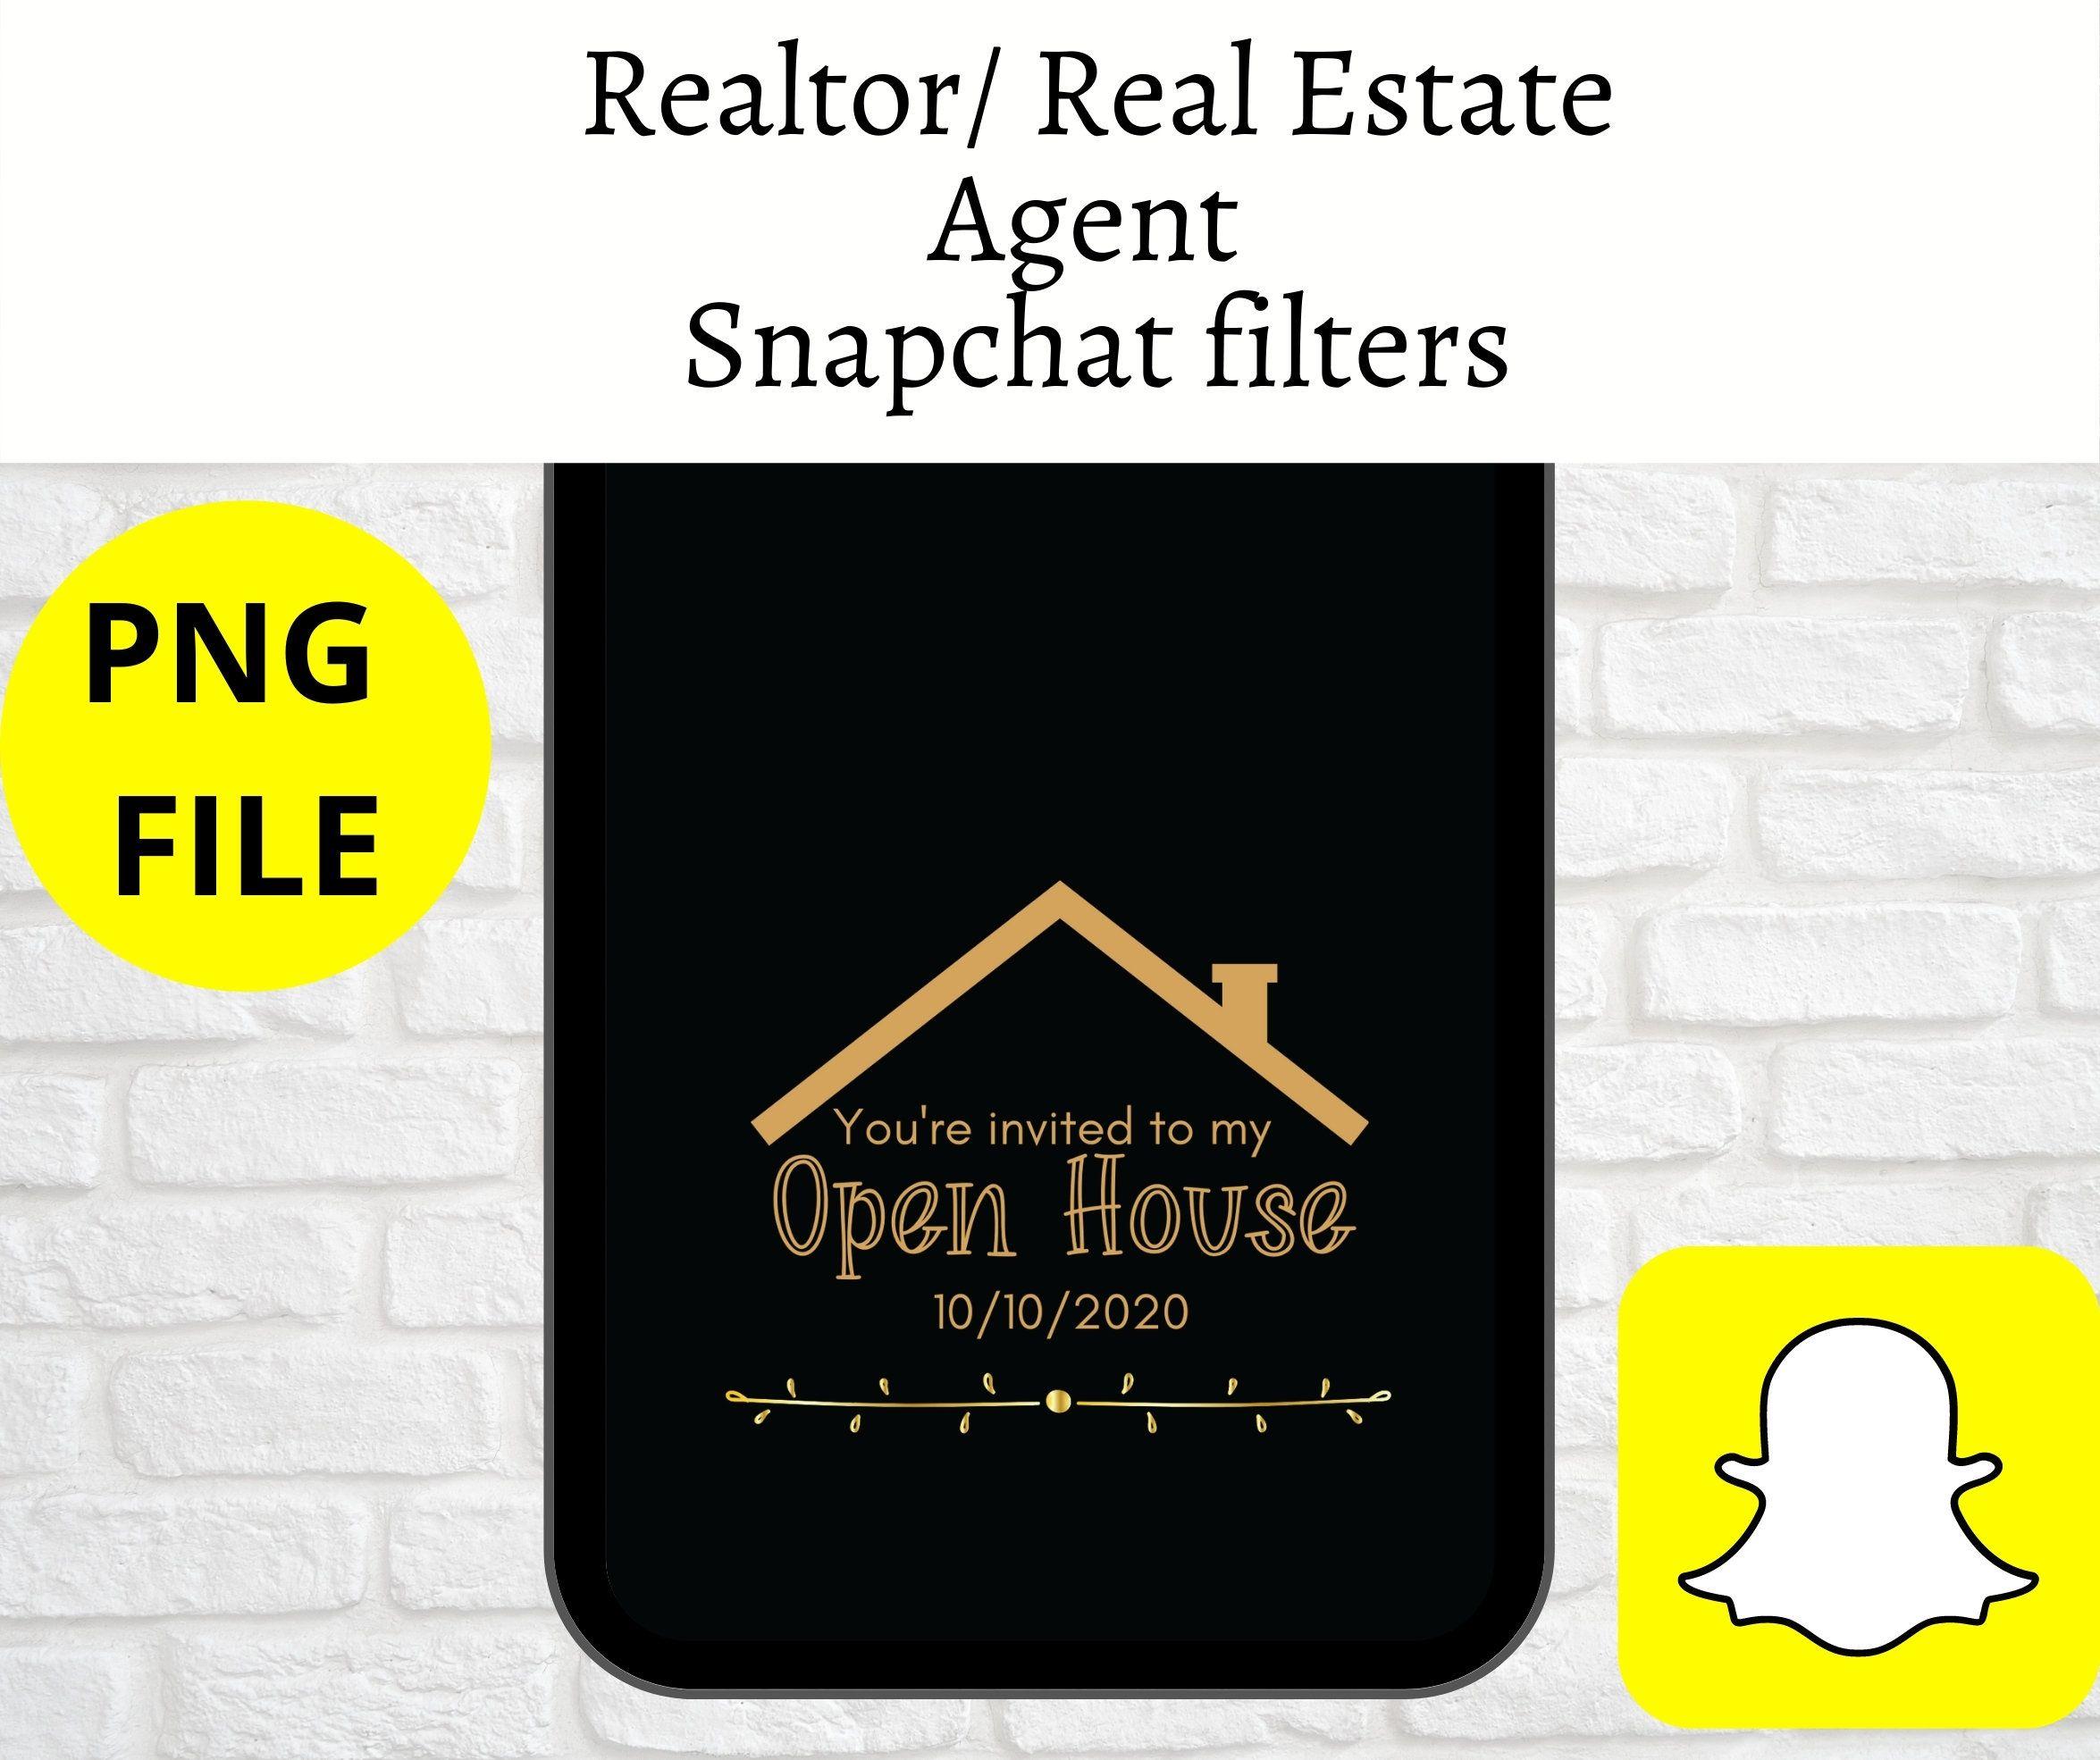 Real Estate Snapchat Filter Snapchat Filter Realtor Real Etsy In 2020 Real Estate Marketing Realtor Social Media Real Estate